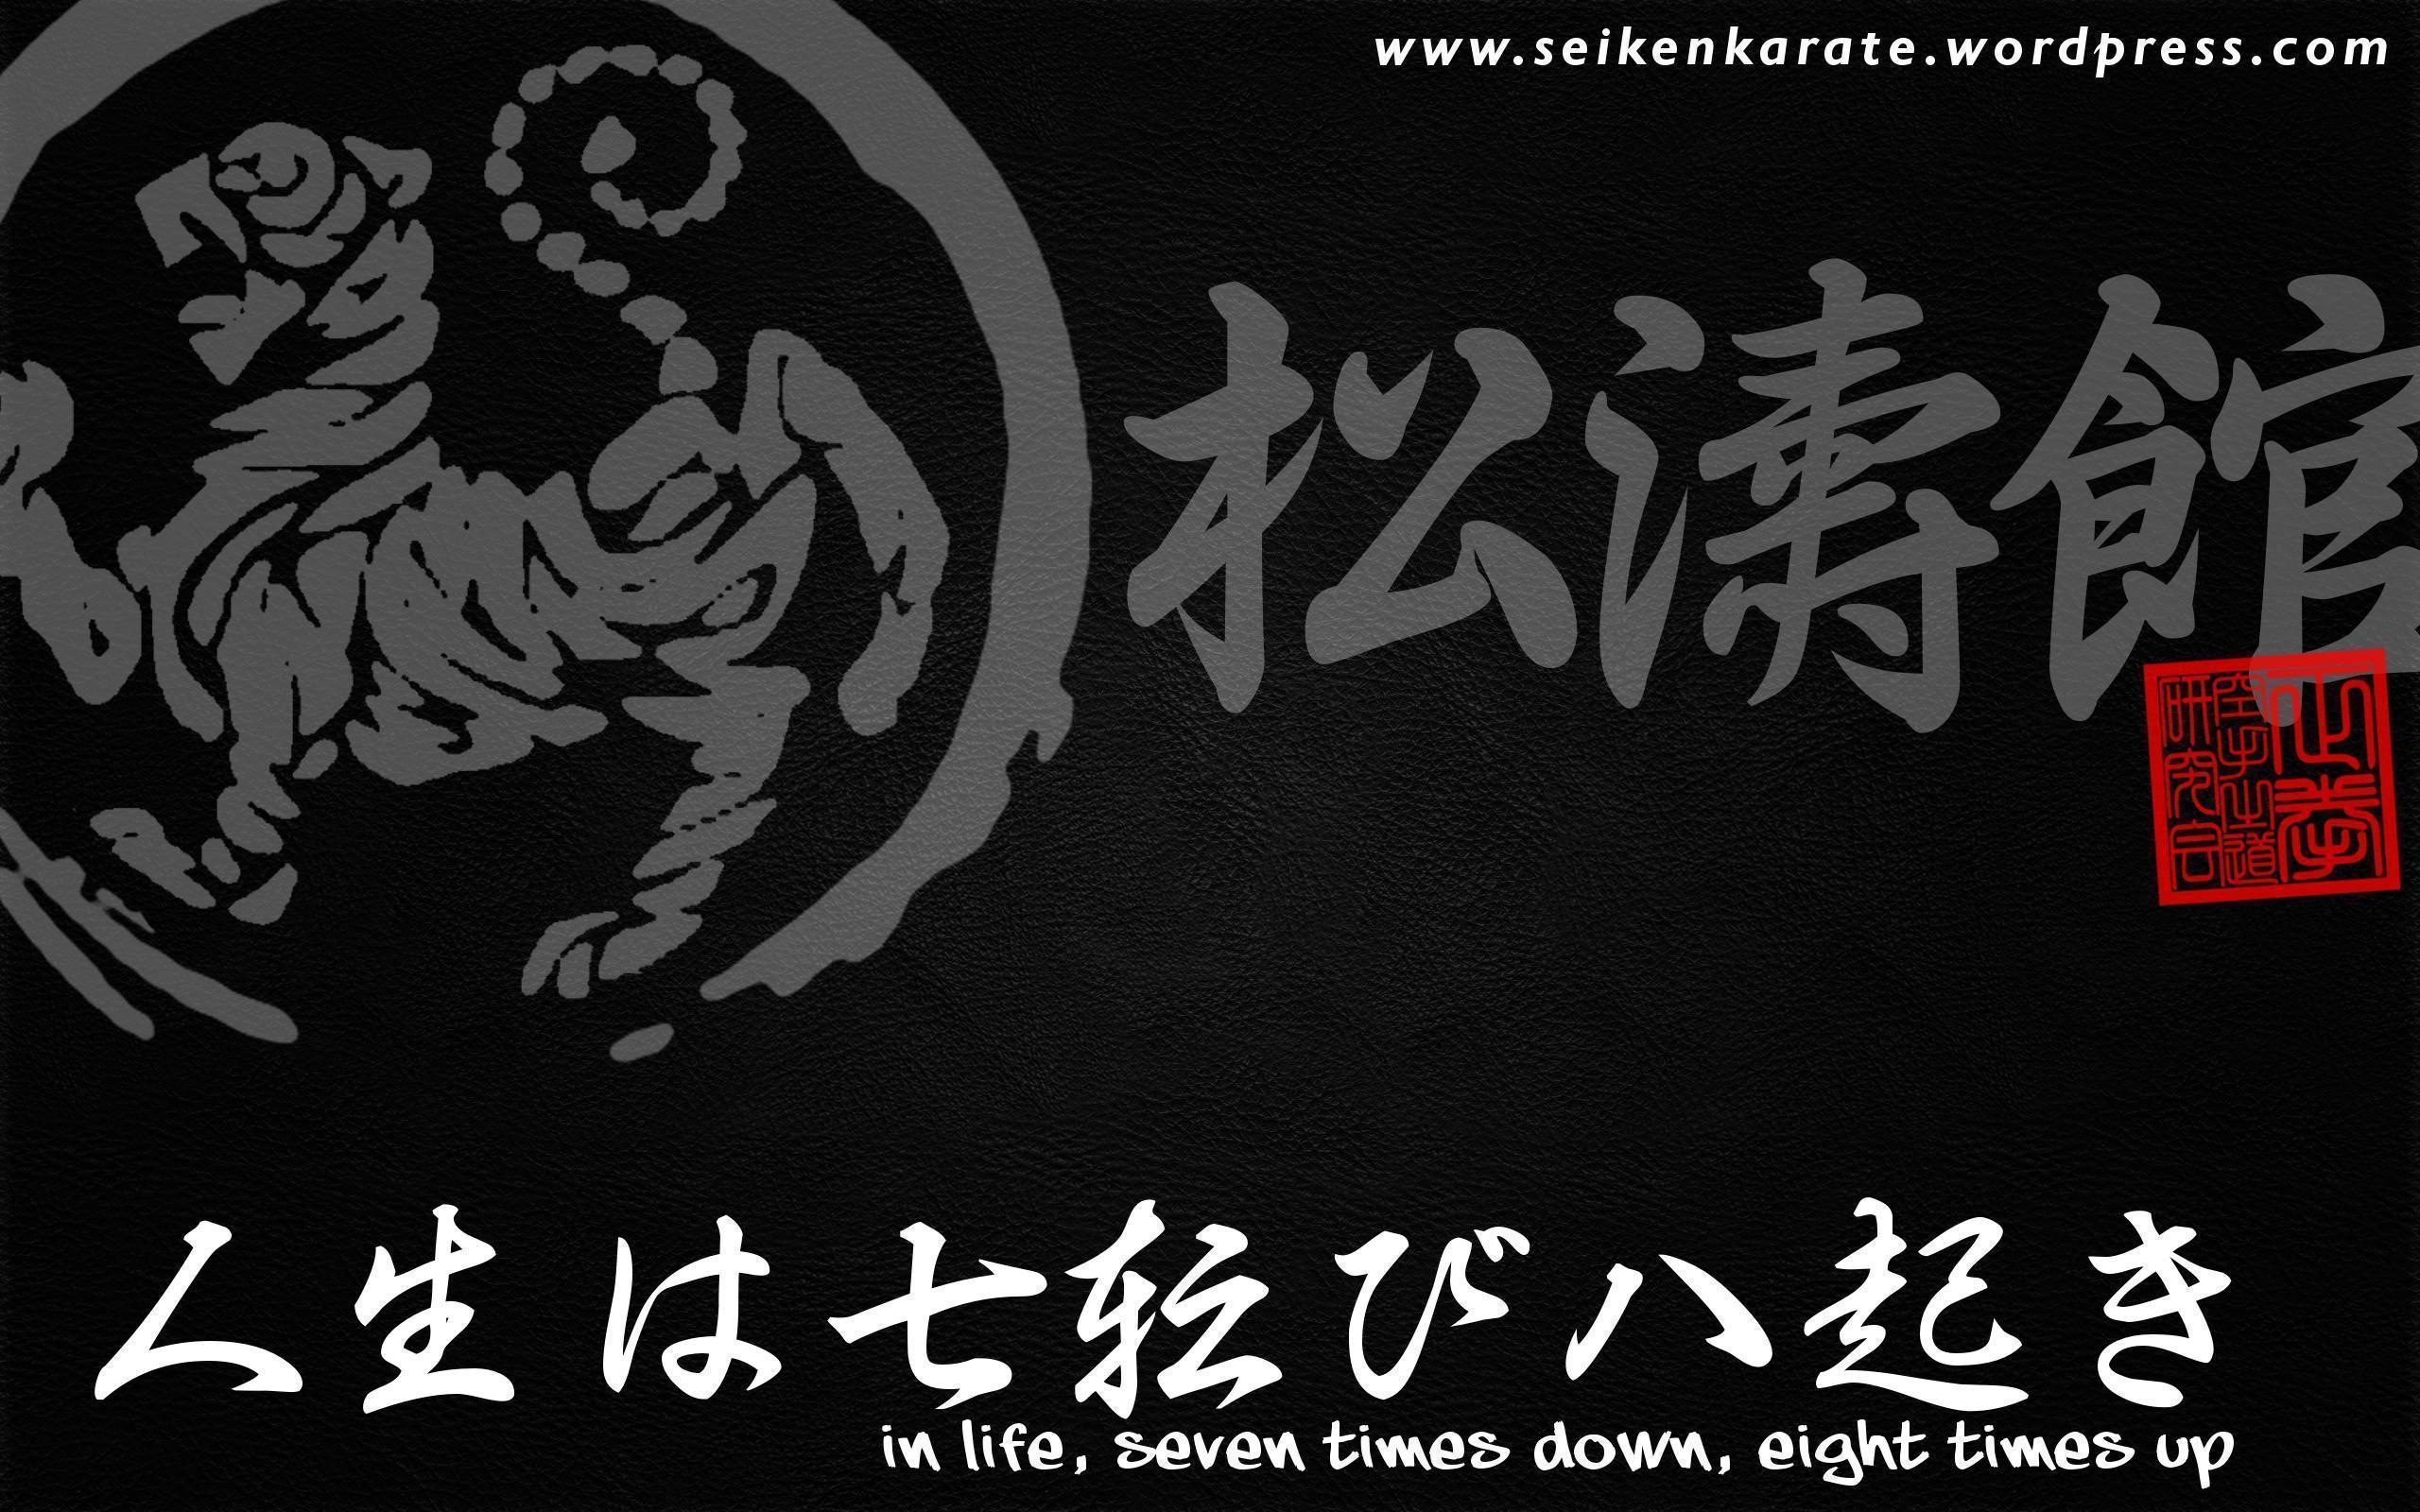 Shotokan Karate Wallpapers Top Free Shotokan Karate